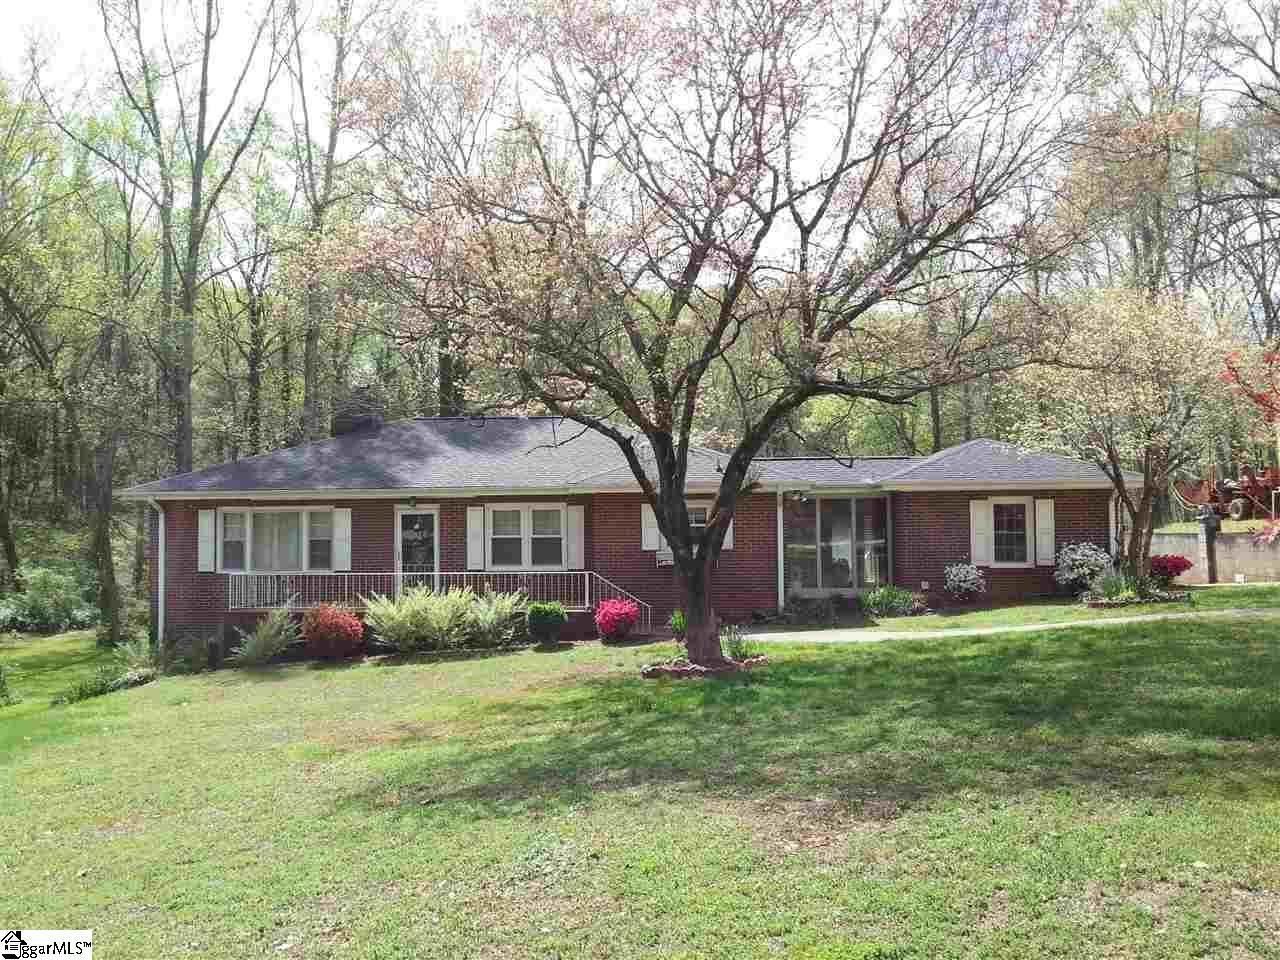 103 River Oaks Drive, Greenville, SC 29611 (#1339383) :: J. Michael Manley Team